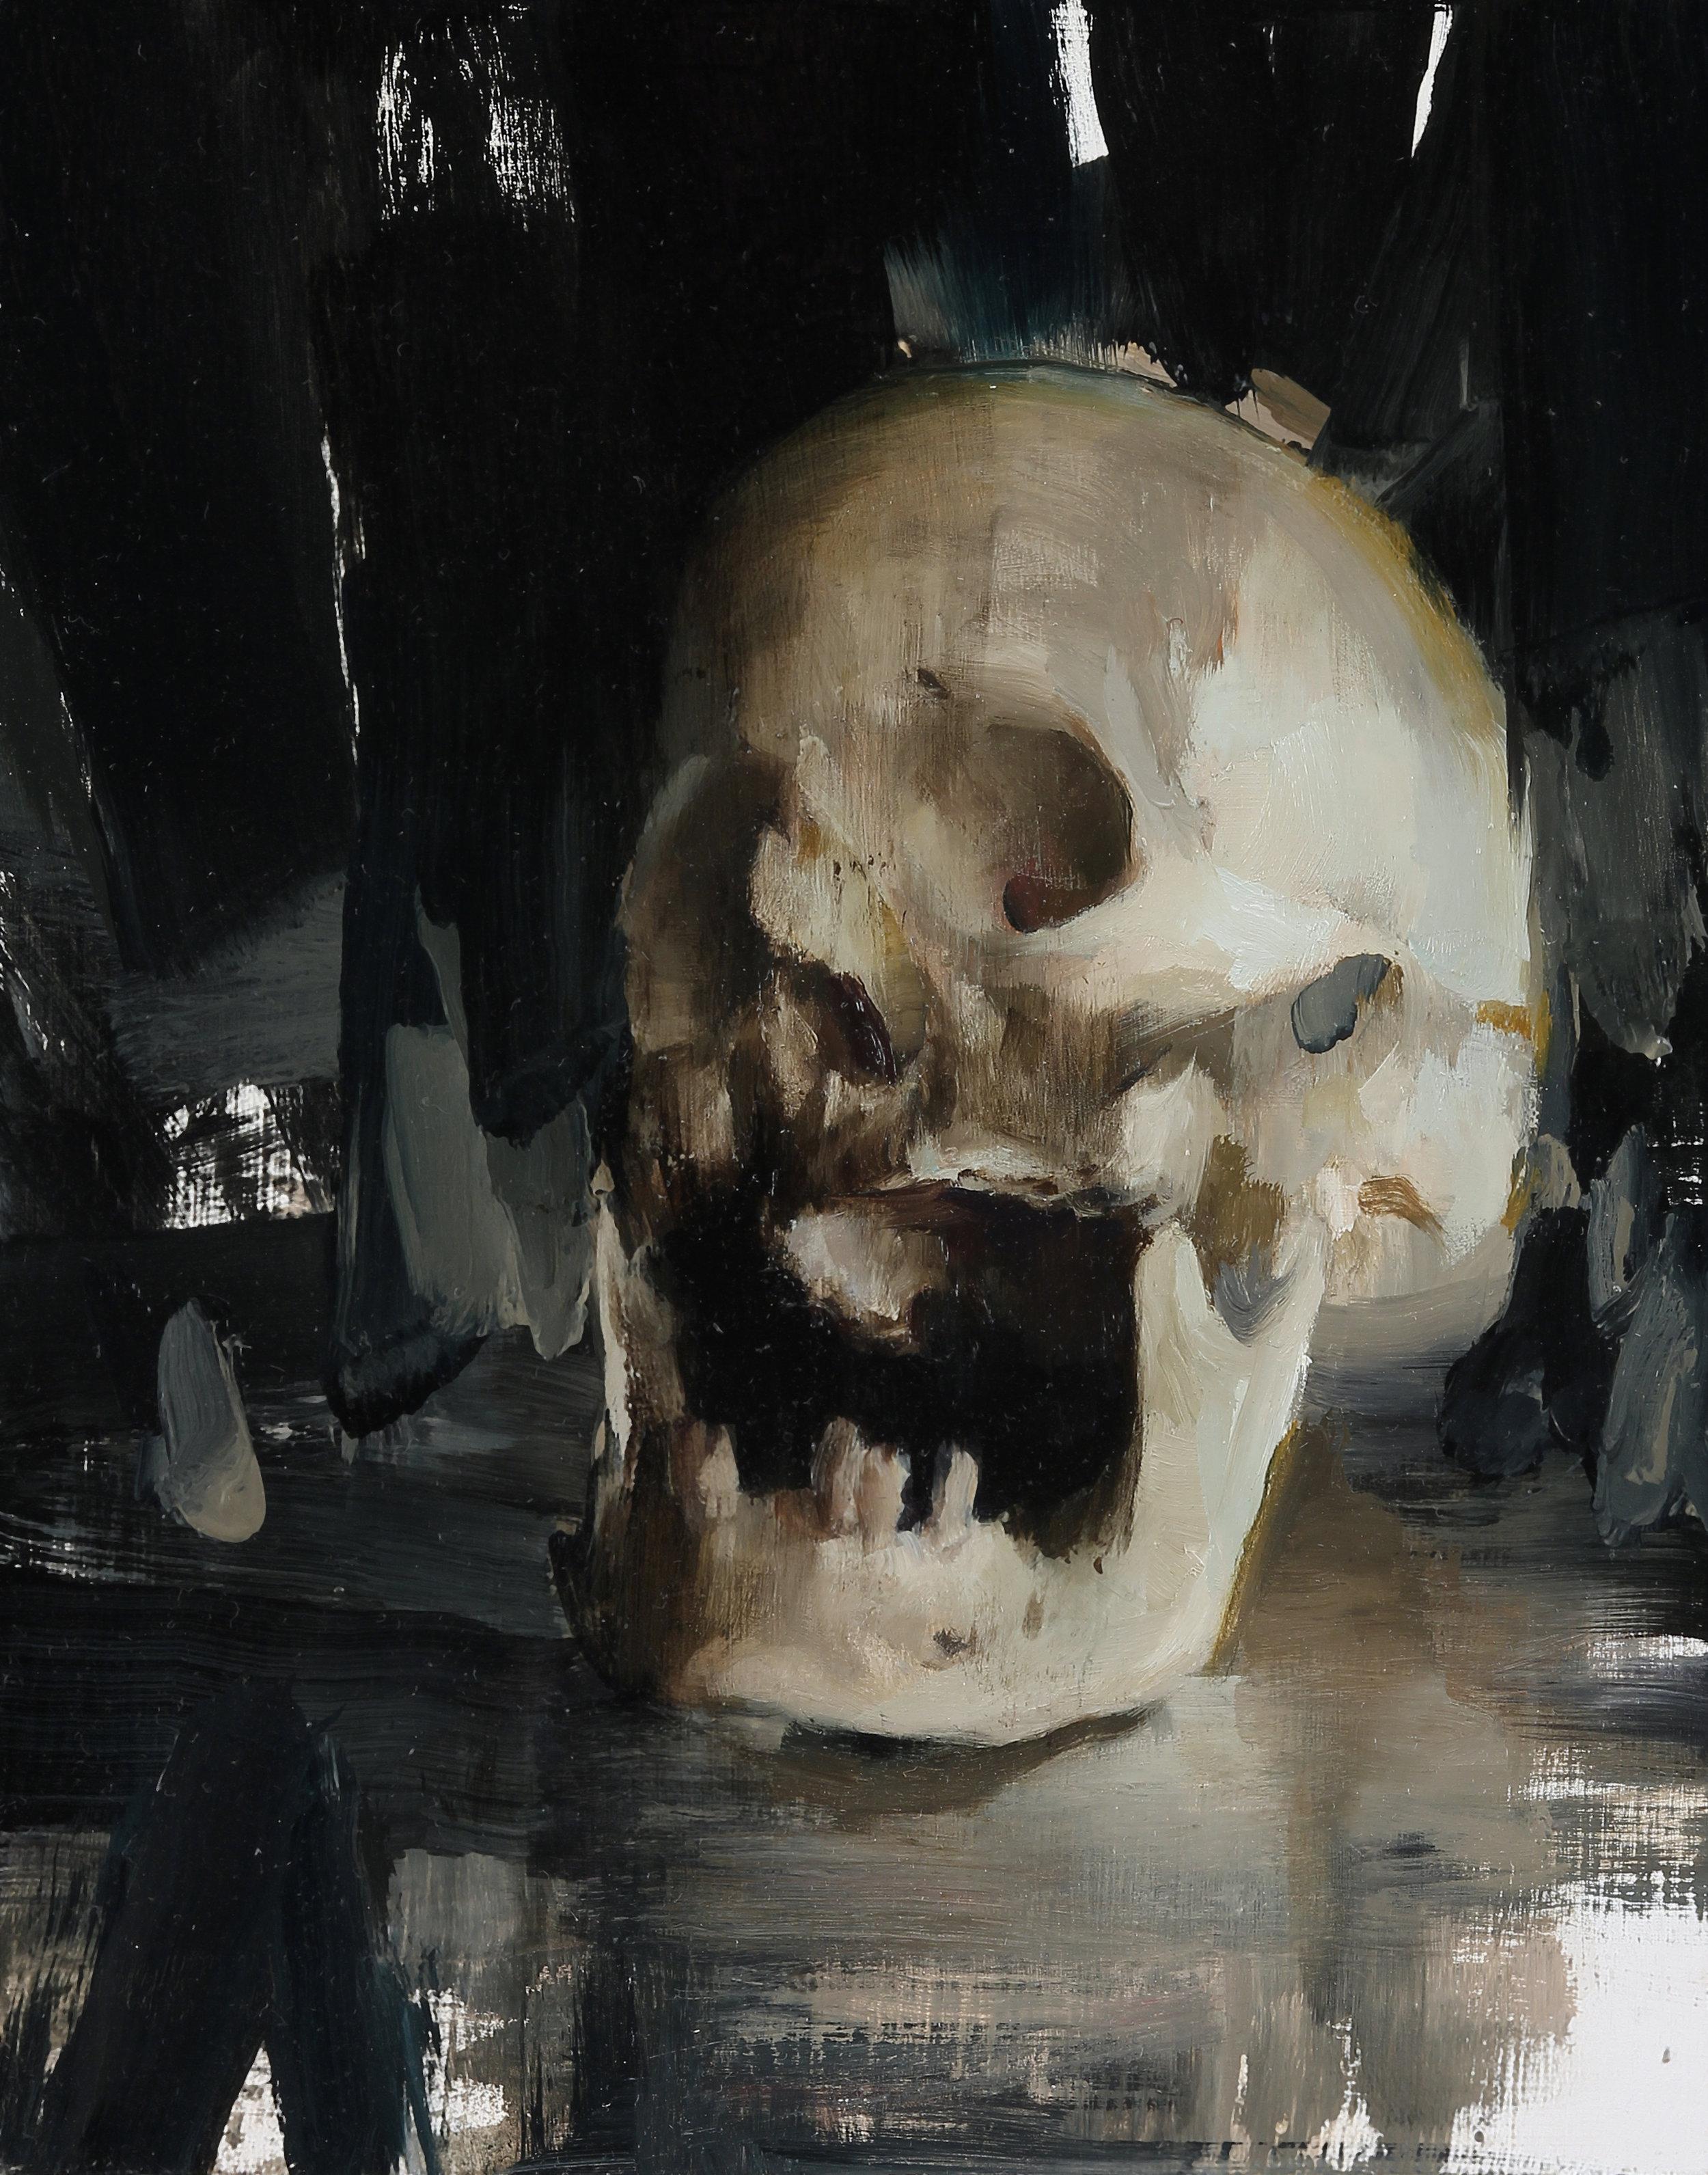 Memento Mori Skull, 10 X 8 inches, oil on panel